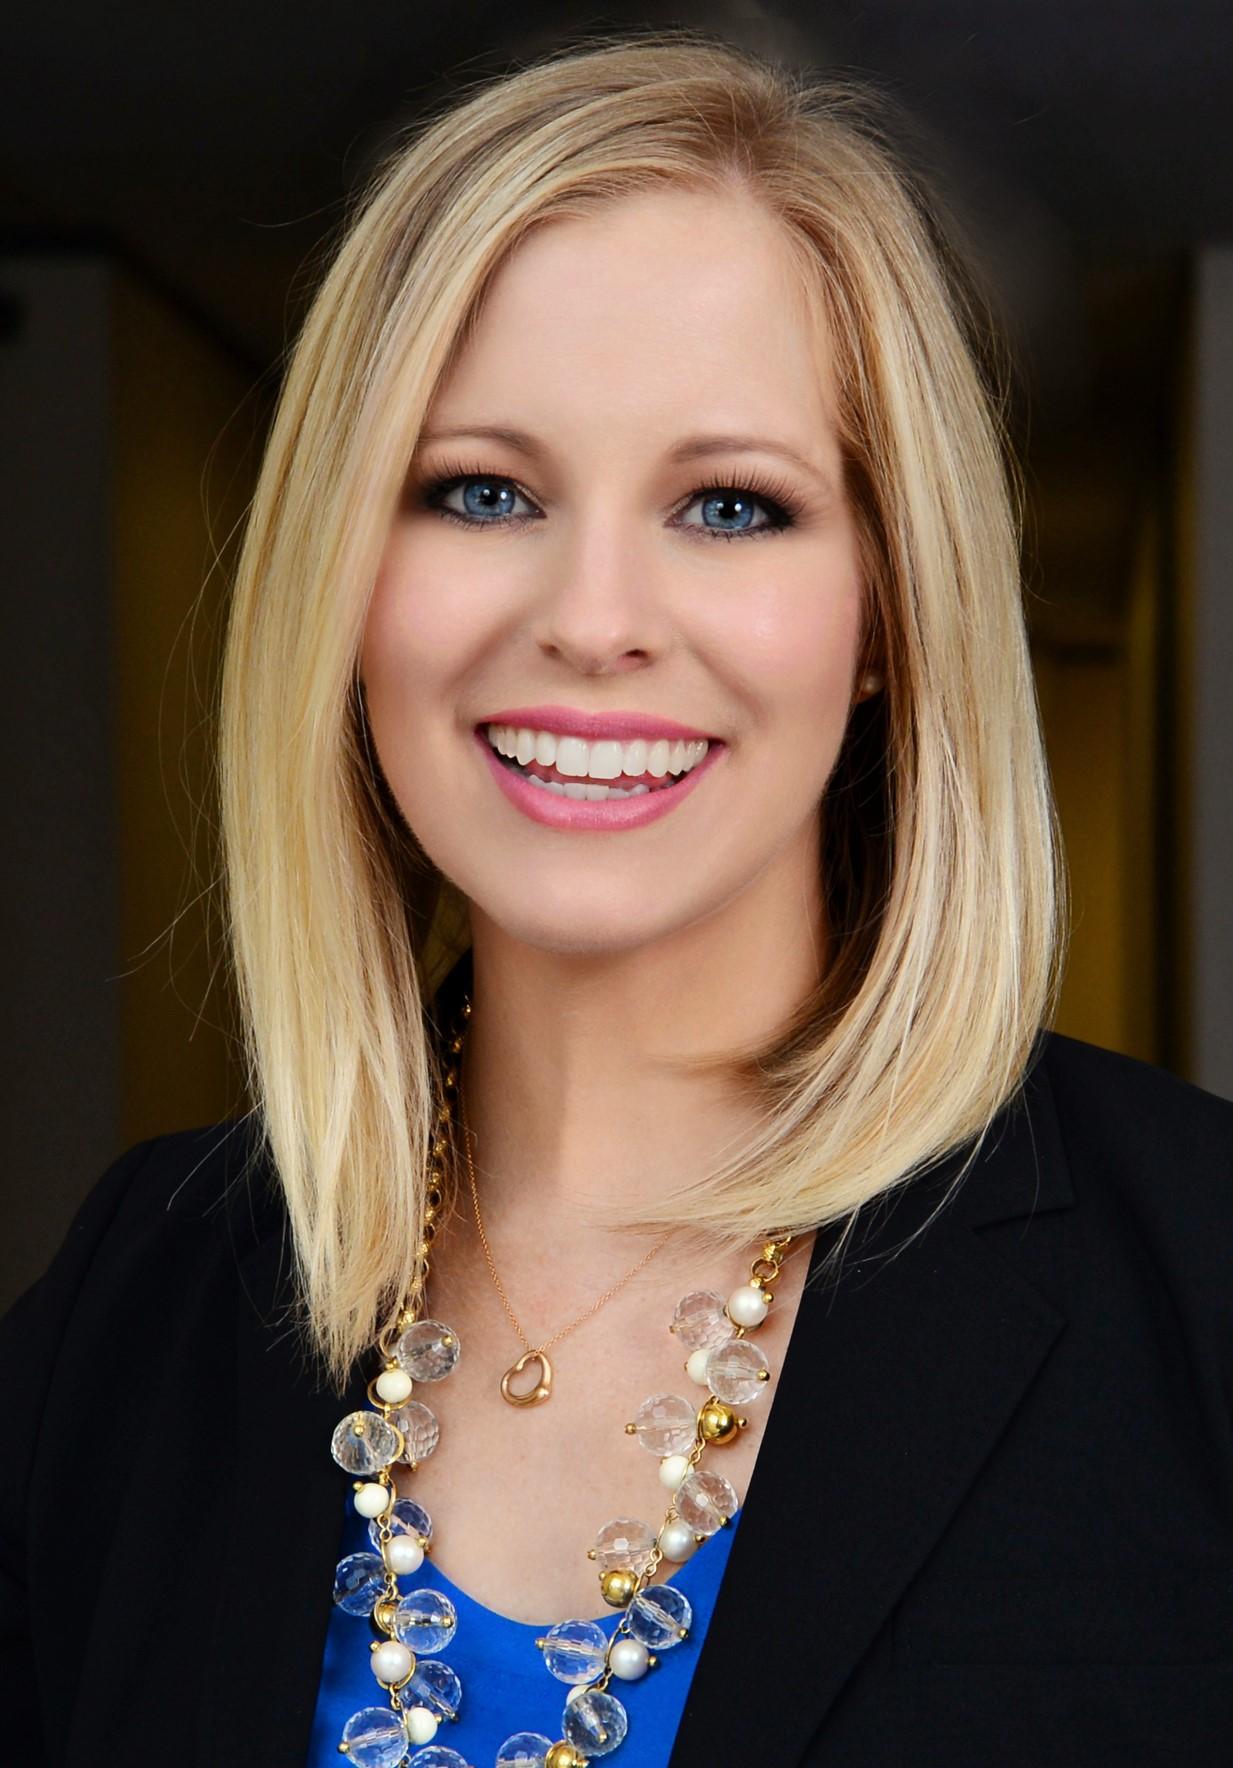 Theresa M. M. Kolos